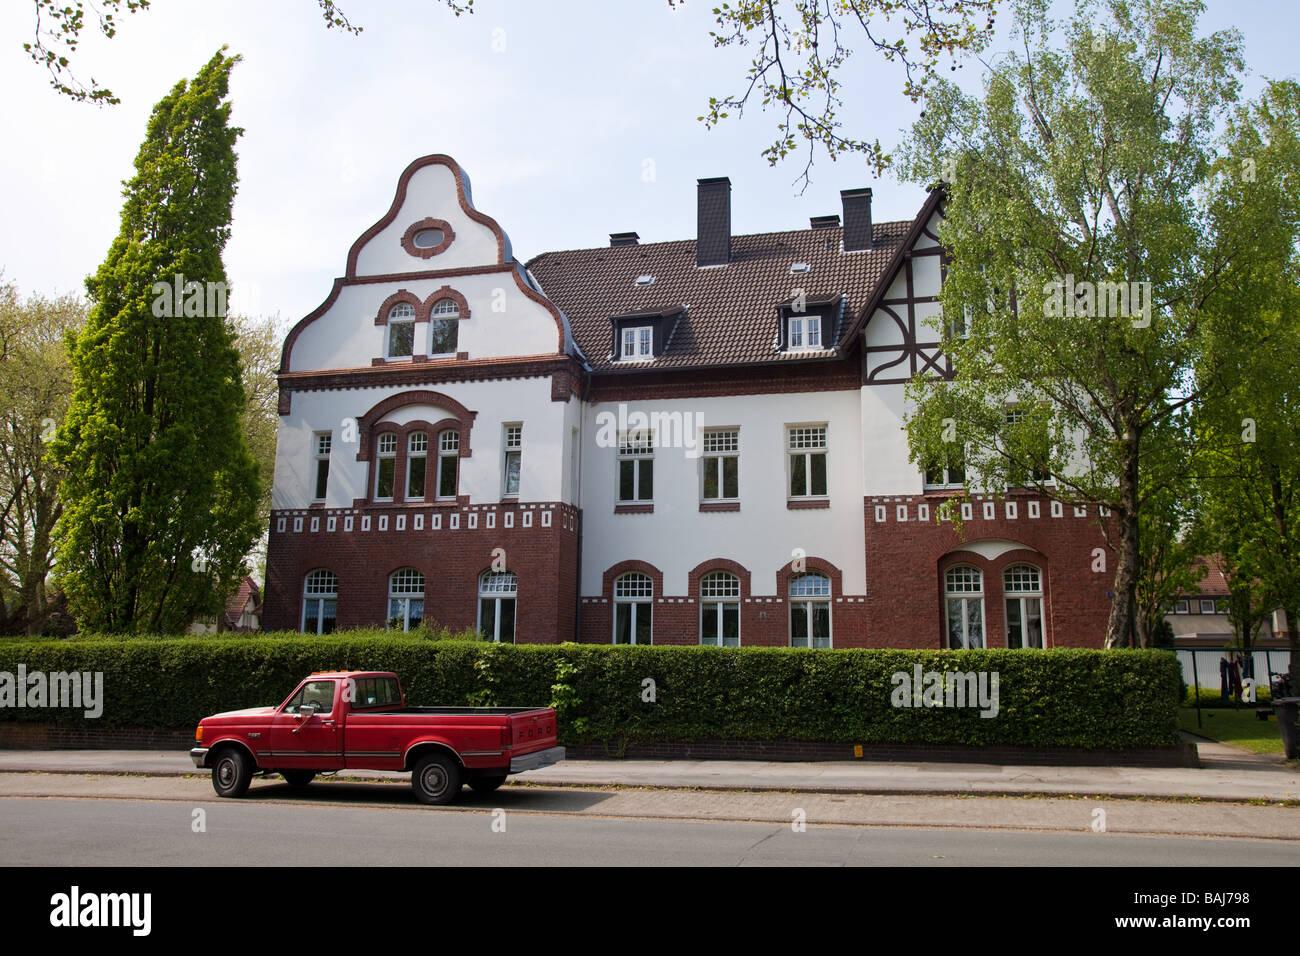 Works housing in the Landwehr colony, next to Zeche Zollern, Dortmund, NRW, North Rhine - Westphalia, Germany. - Stock Image